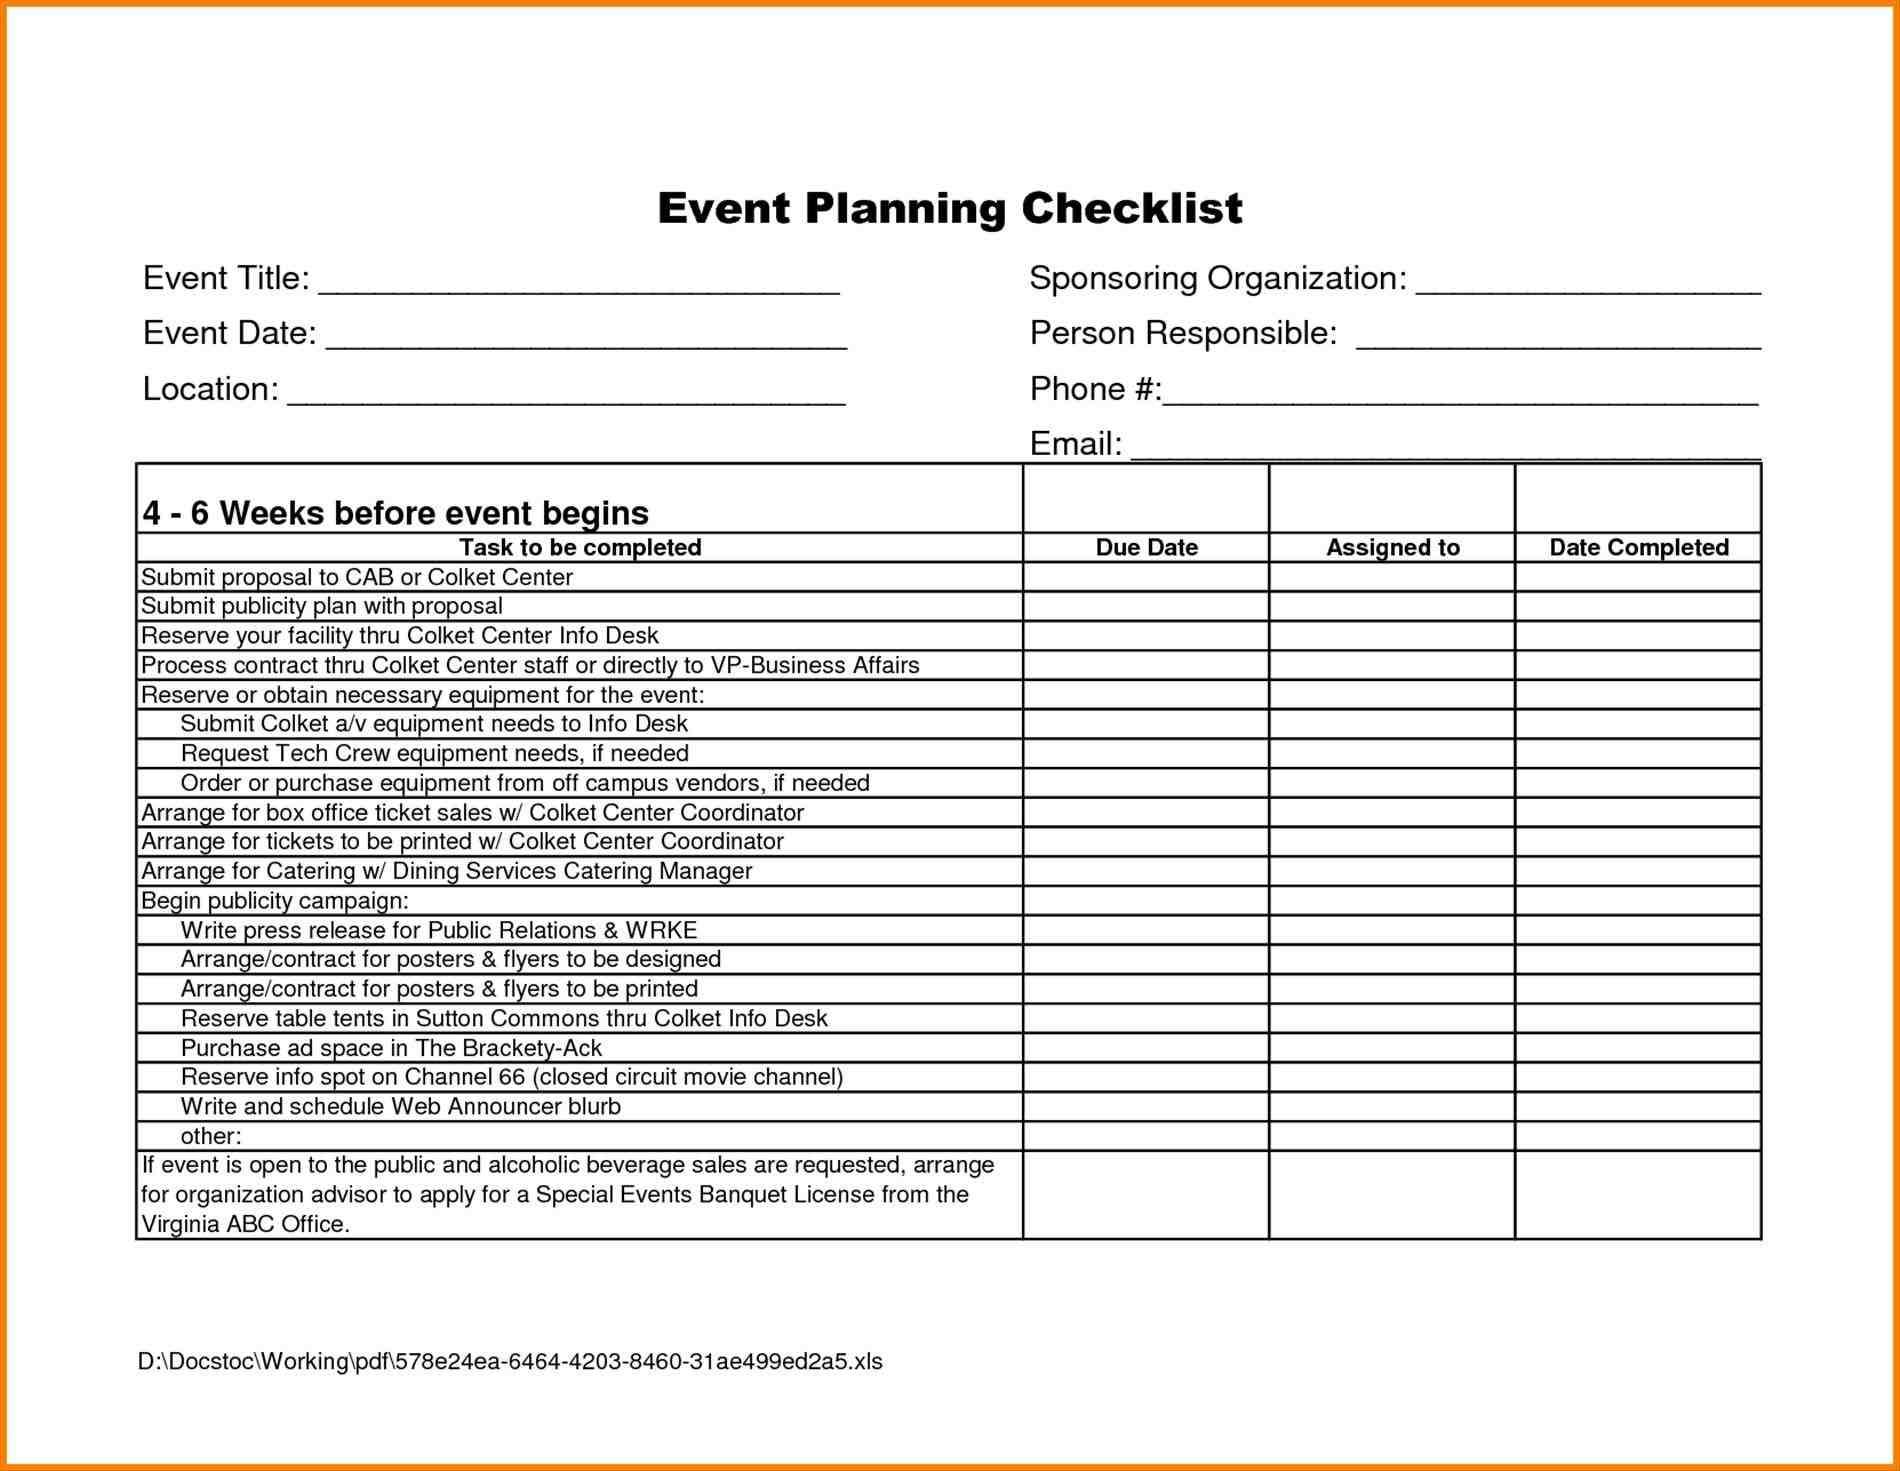 timeline template spectacular rhmonroerisingcom great executive summa resume examples charity rhdeaoscuracom great Event Planning Template executive summa resume examples charity